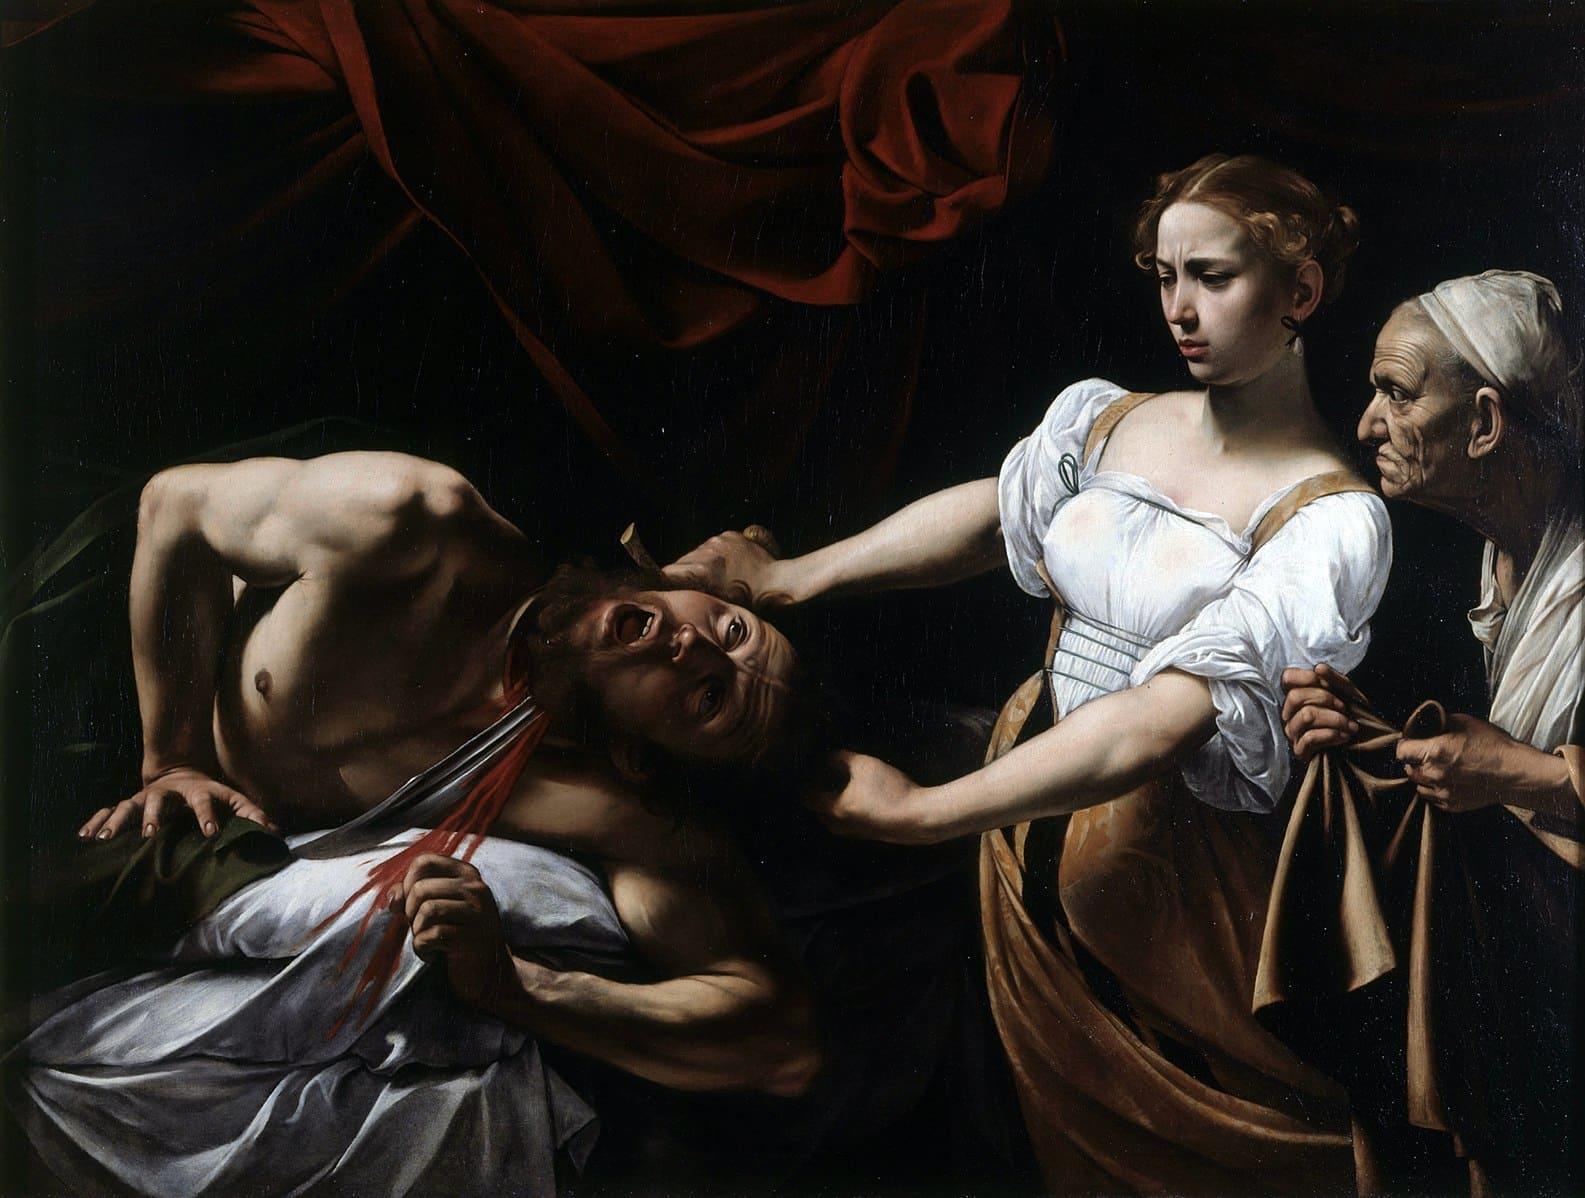 assassinat judith chemiser blanc drapé servante